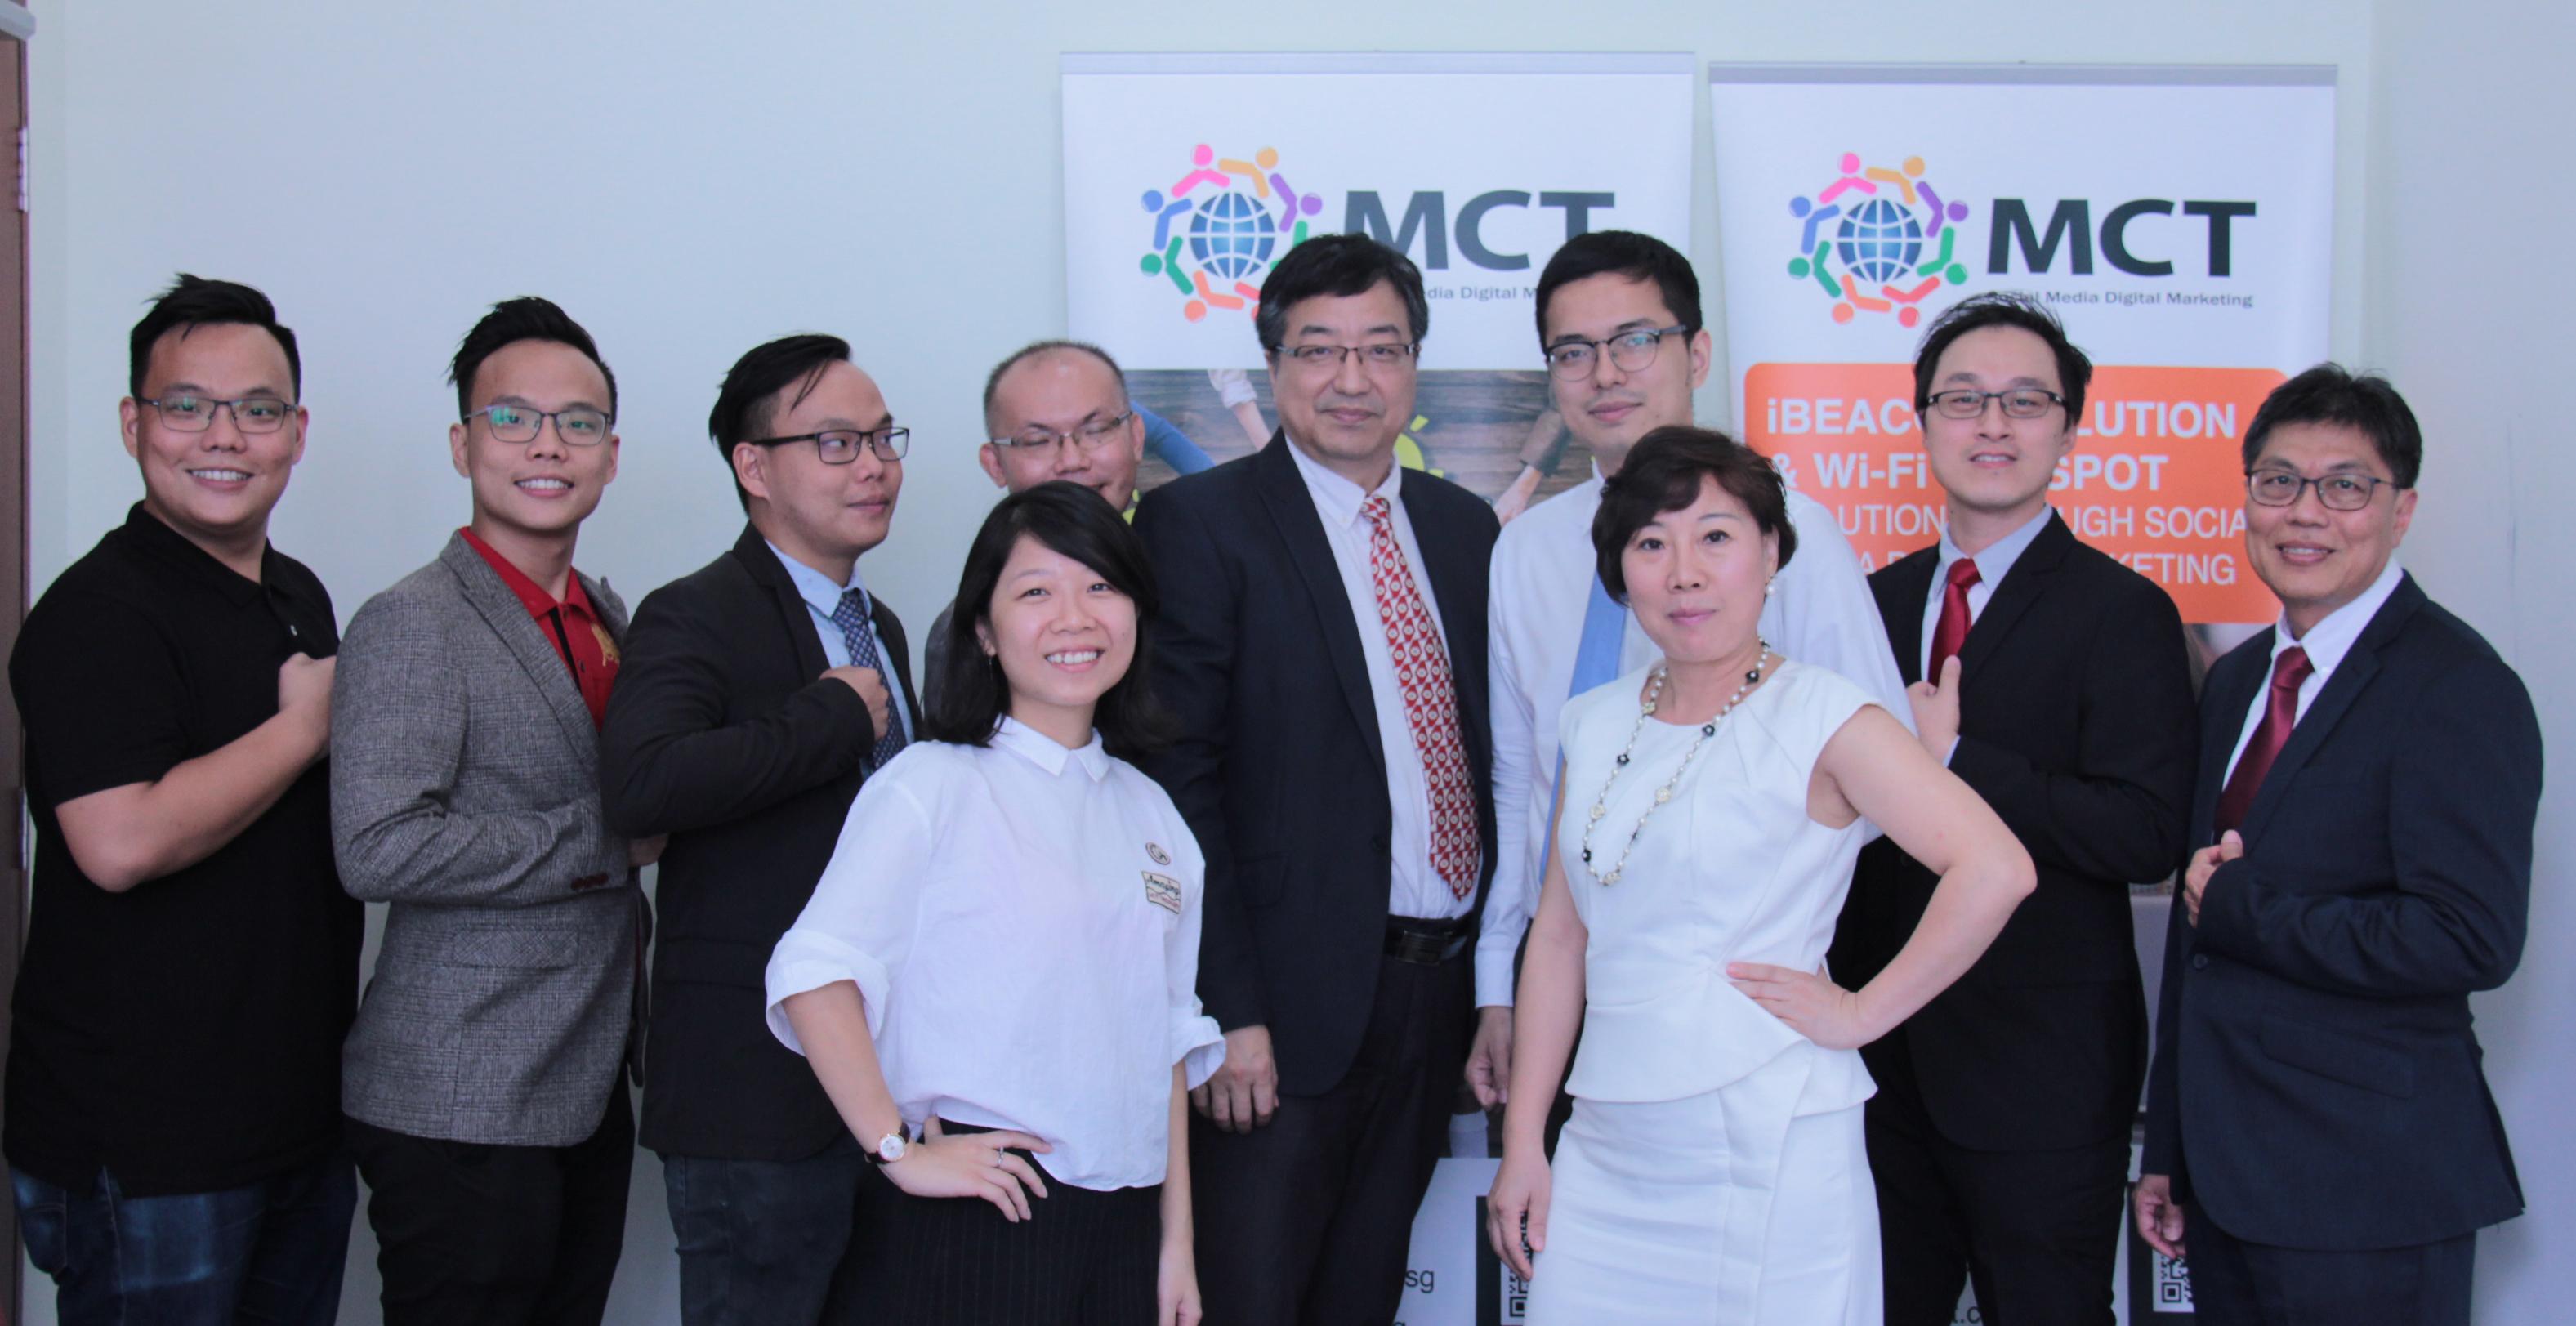 MCT PAY Team